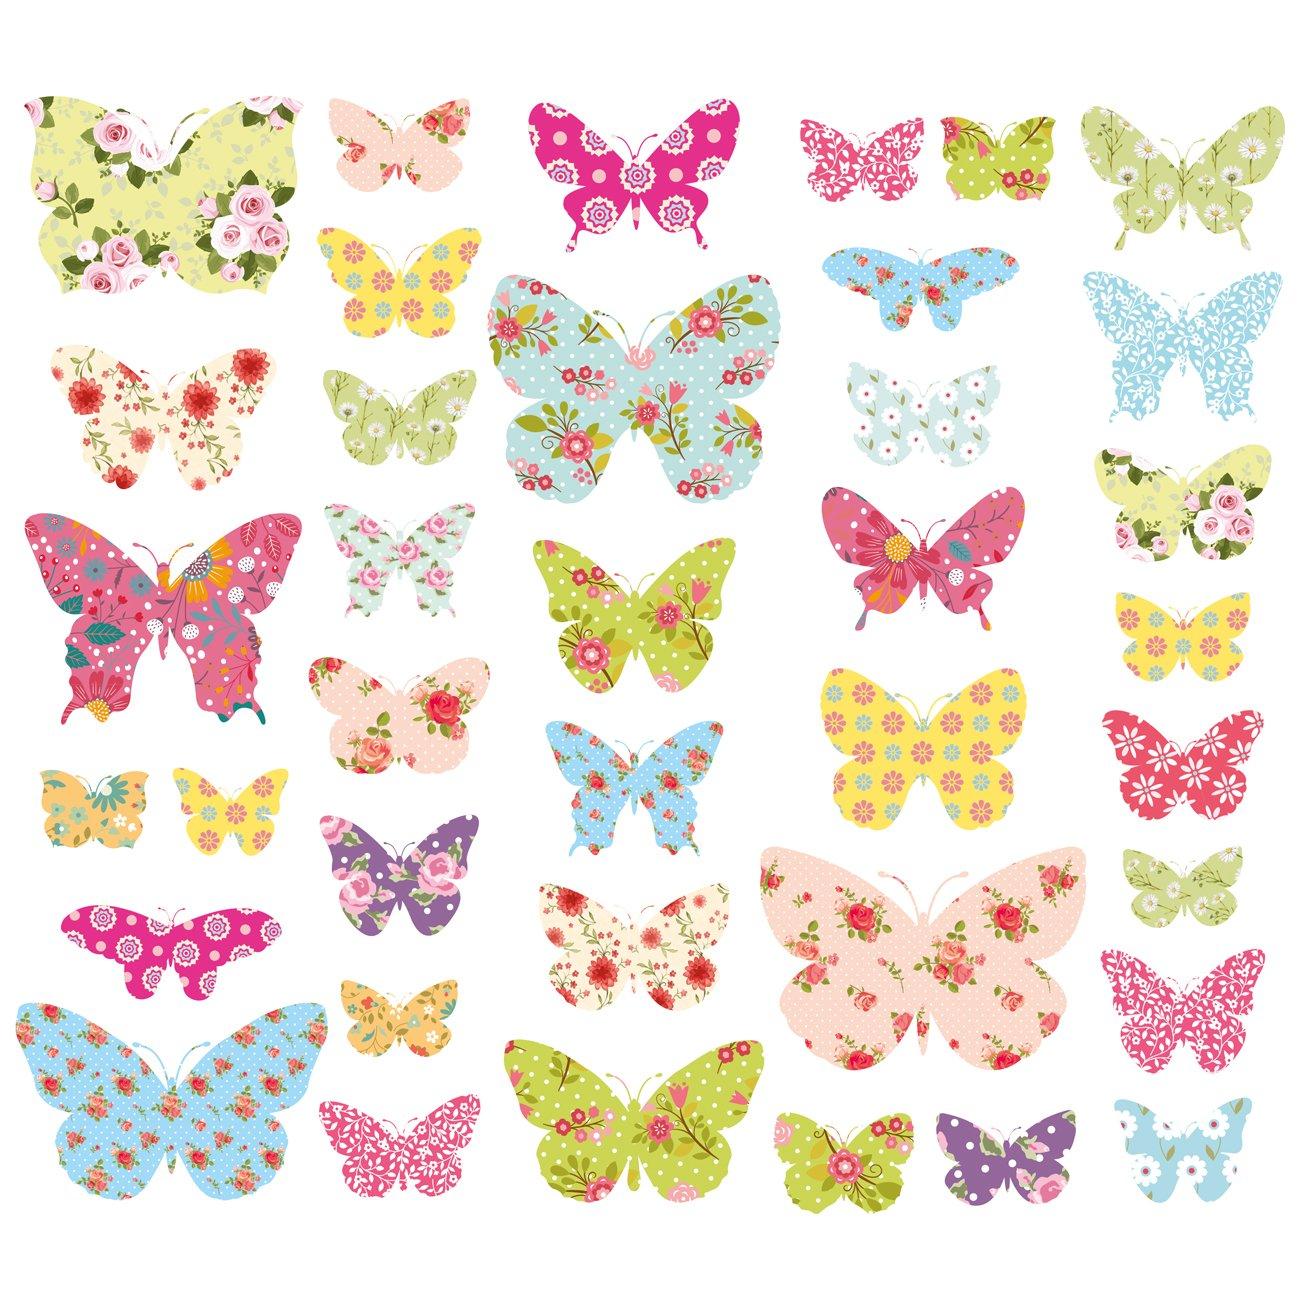 Vinilo Decorativo Pared [0O9UTIDC] mariposas